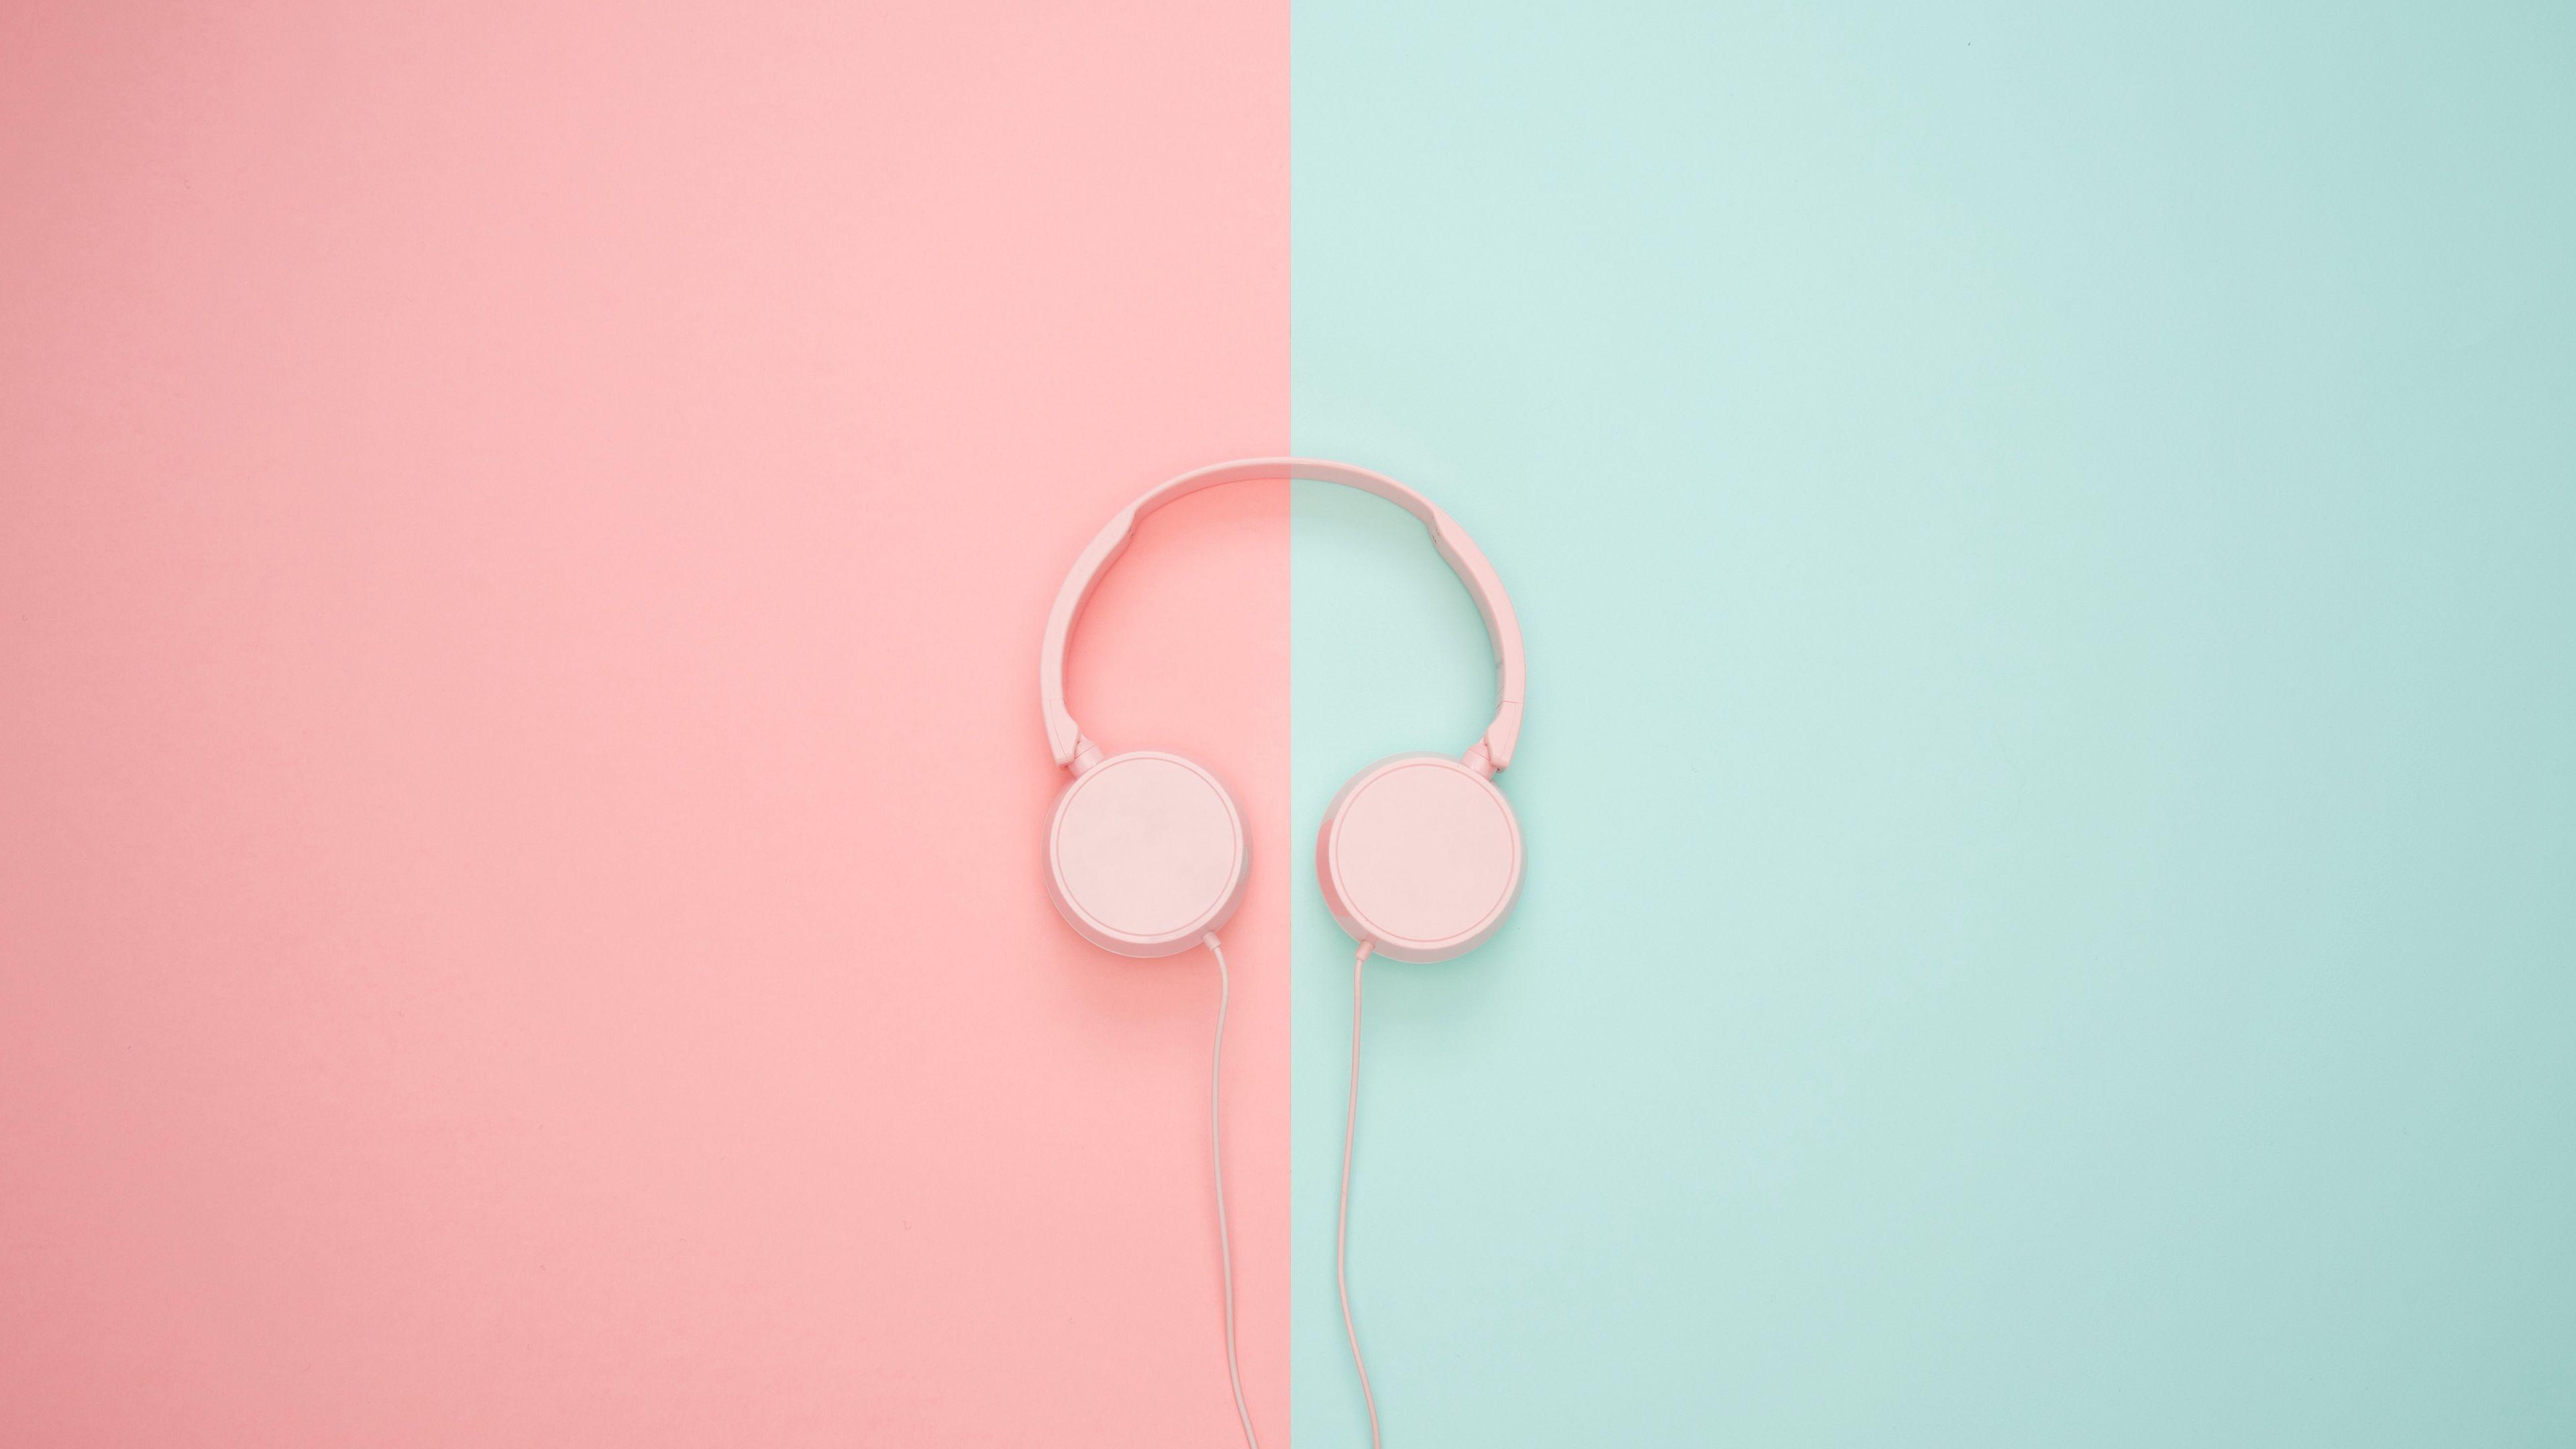 3840x2160 Wallpaper headphones, minimalism, pink, pastel